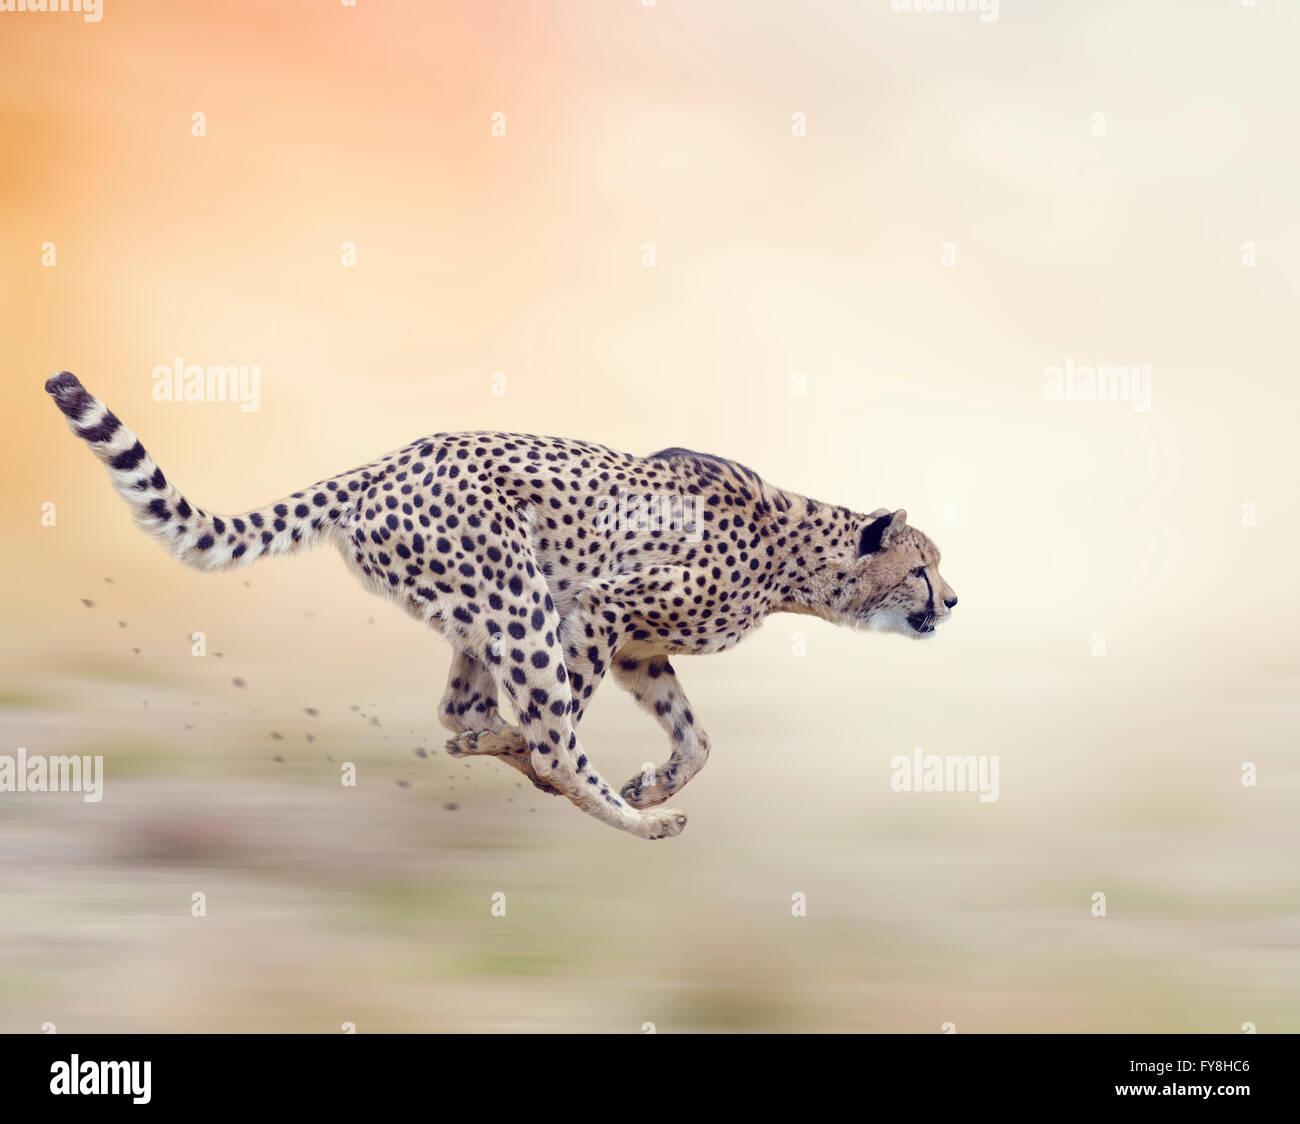 Cheetah corriendo en Soft Focus Antecedentes Imagen De Stock